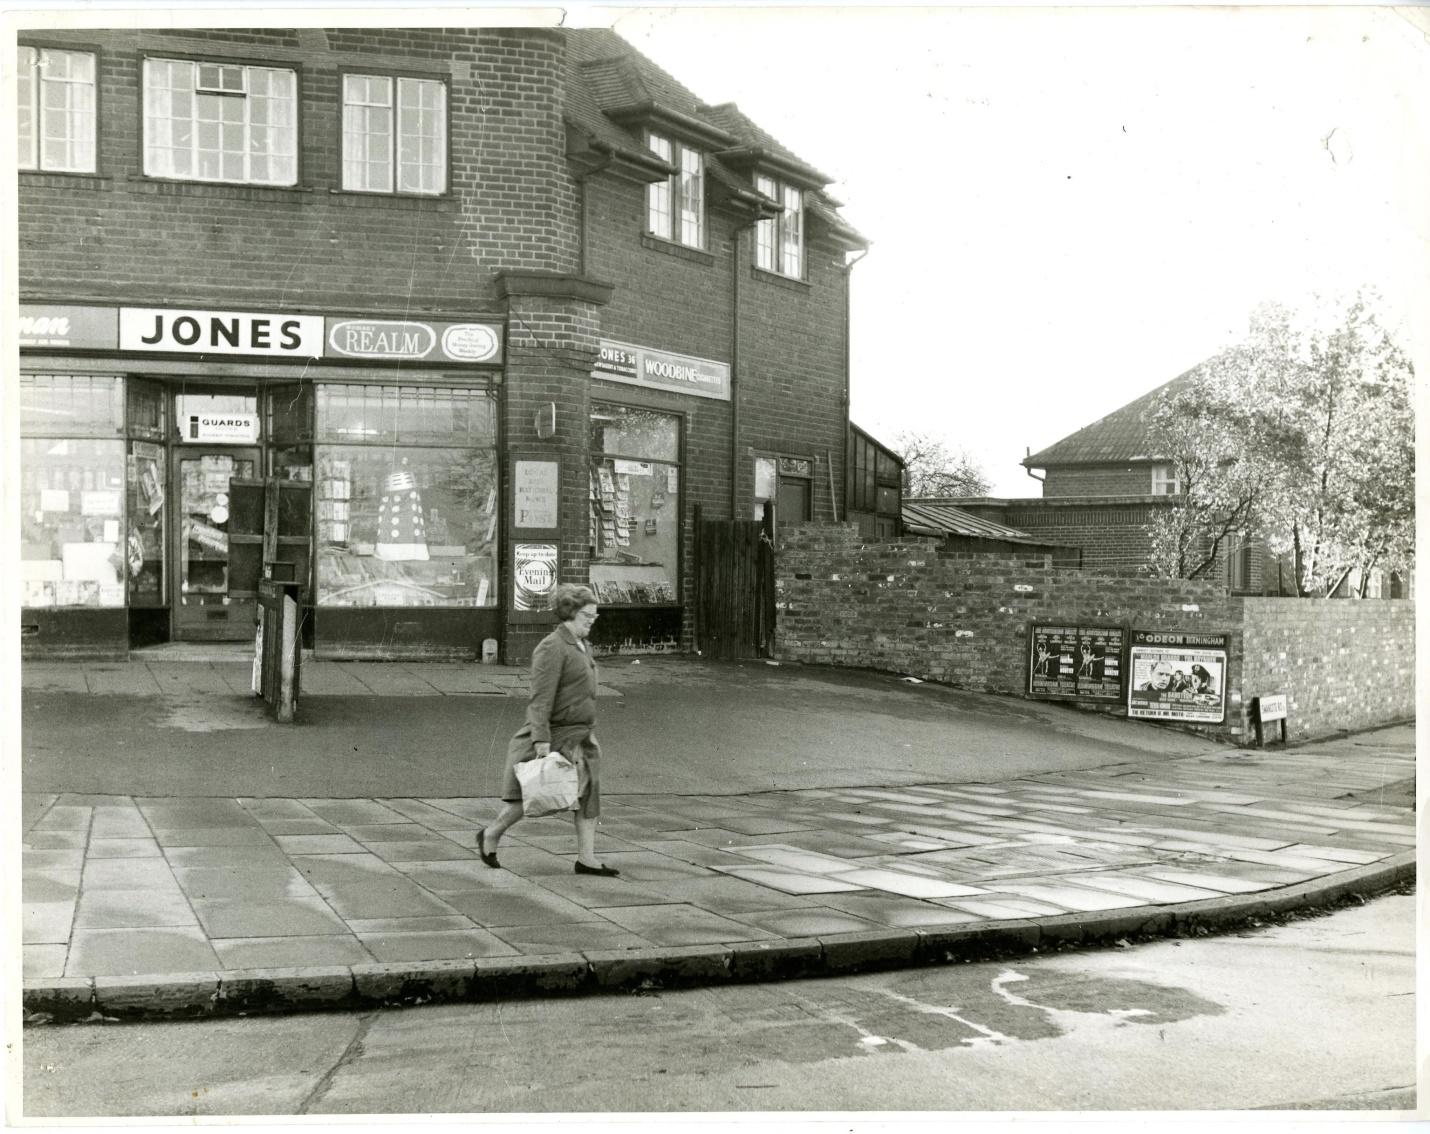 Photo of Glebe Farm Road, Birmingham showing Berwick's Dalek Playsuit. From Sheffield's Press Agency.